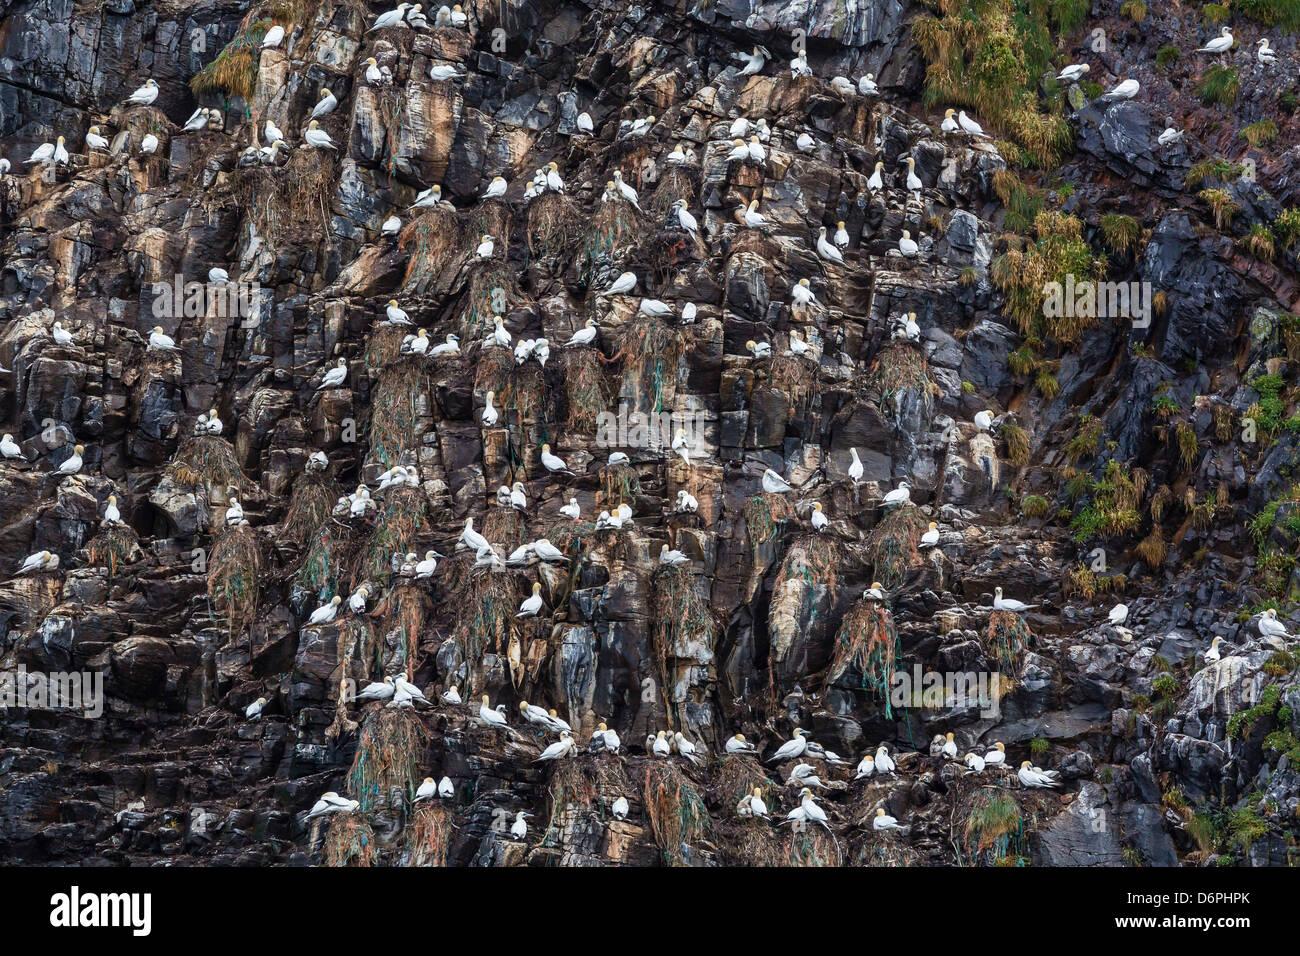 Northern gannets (Morus bassanus) on breeding colony site at Runde Island, Norway, Scandinavia, Europe - Stock Image